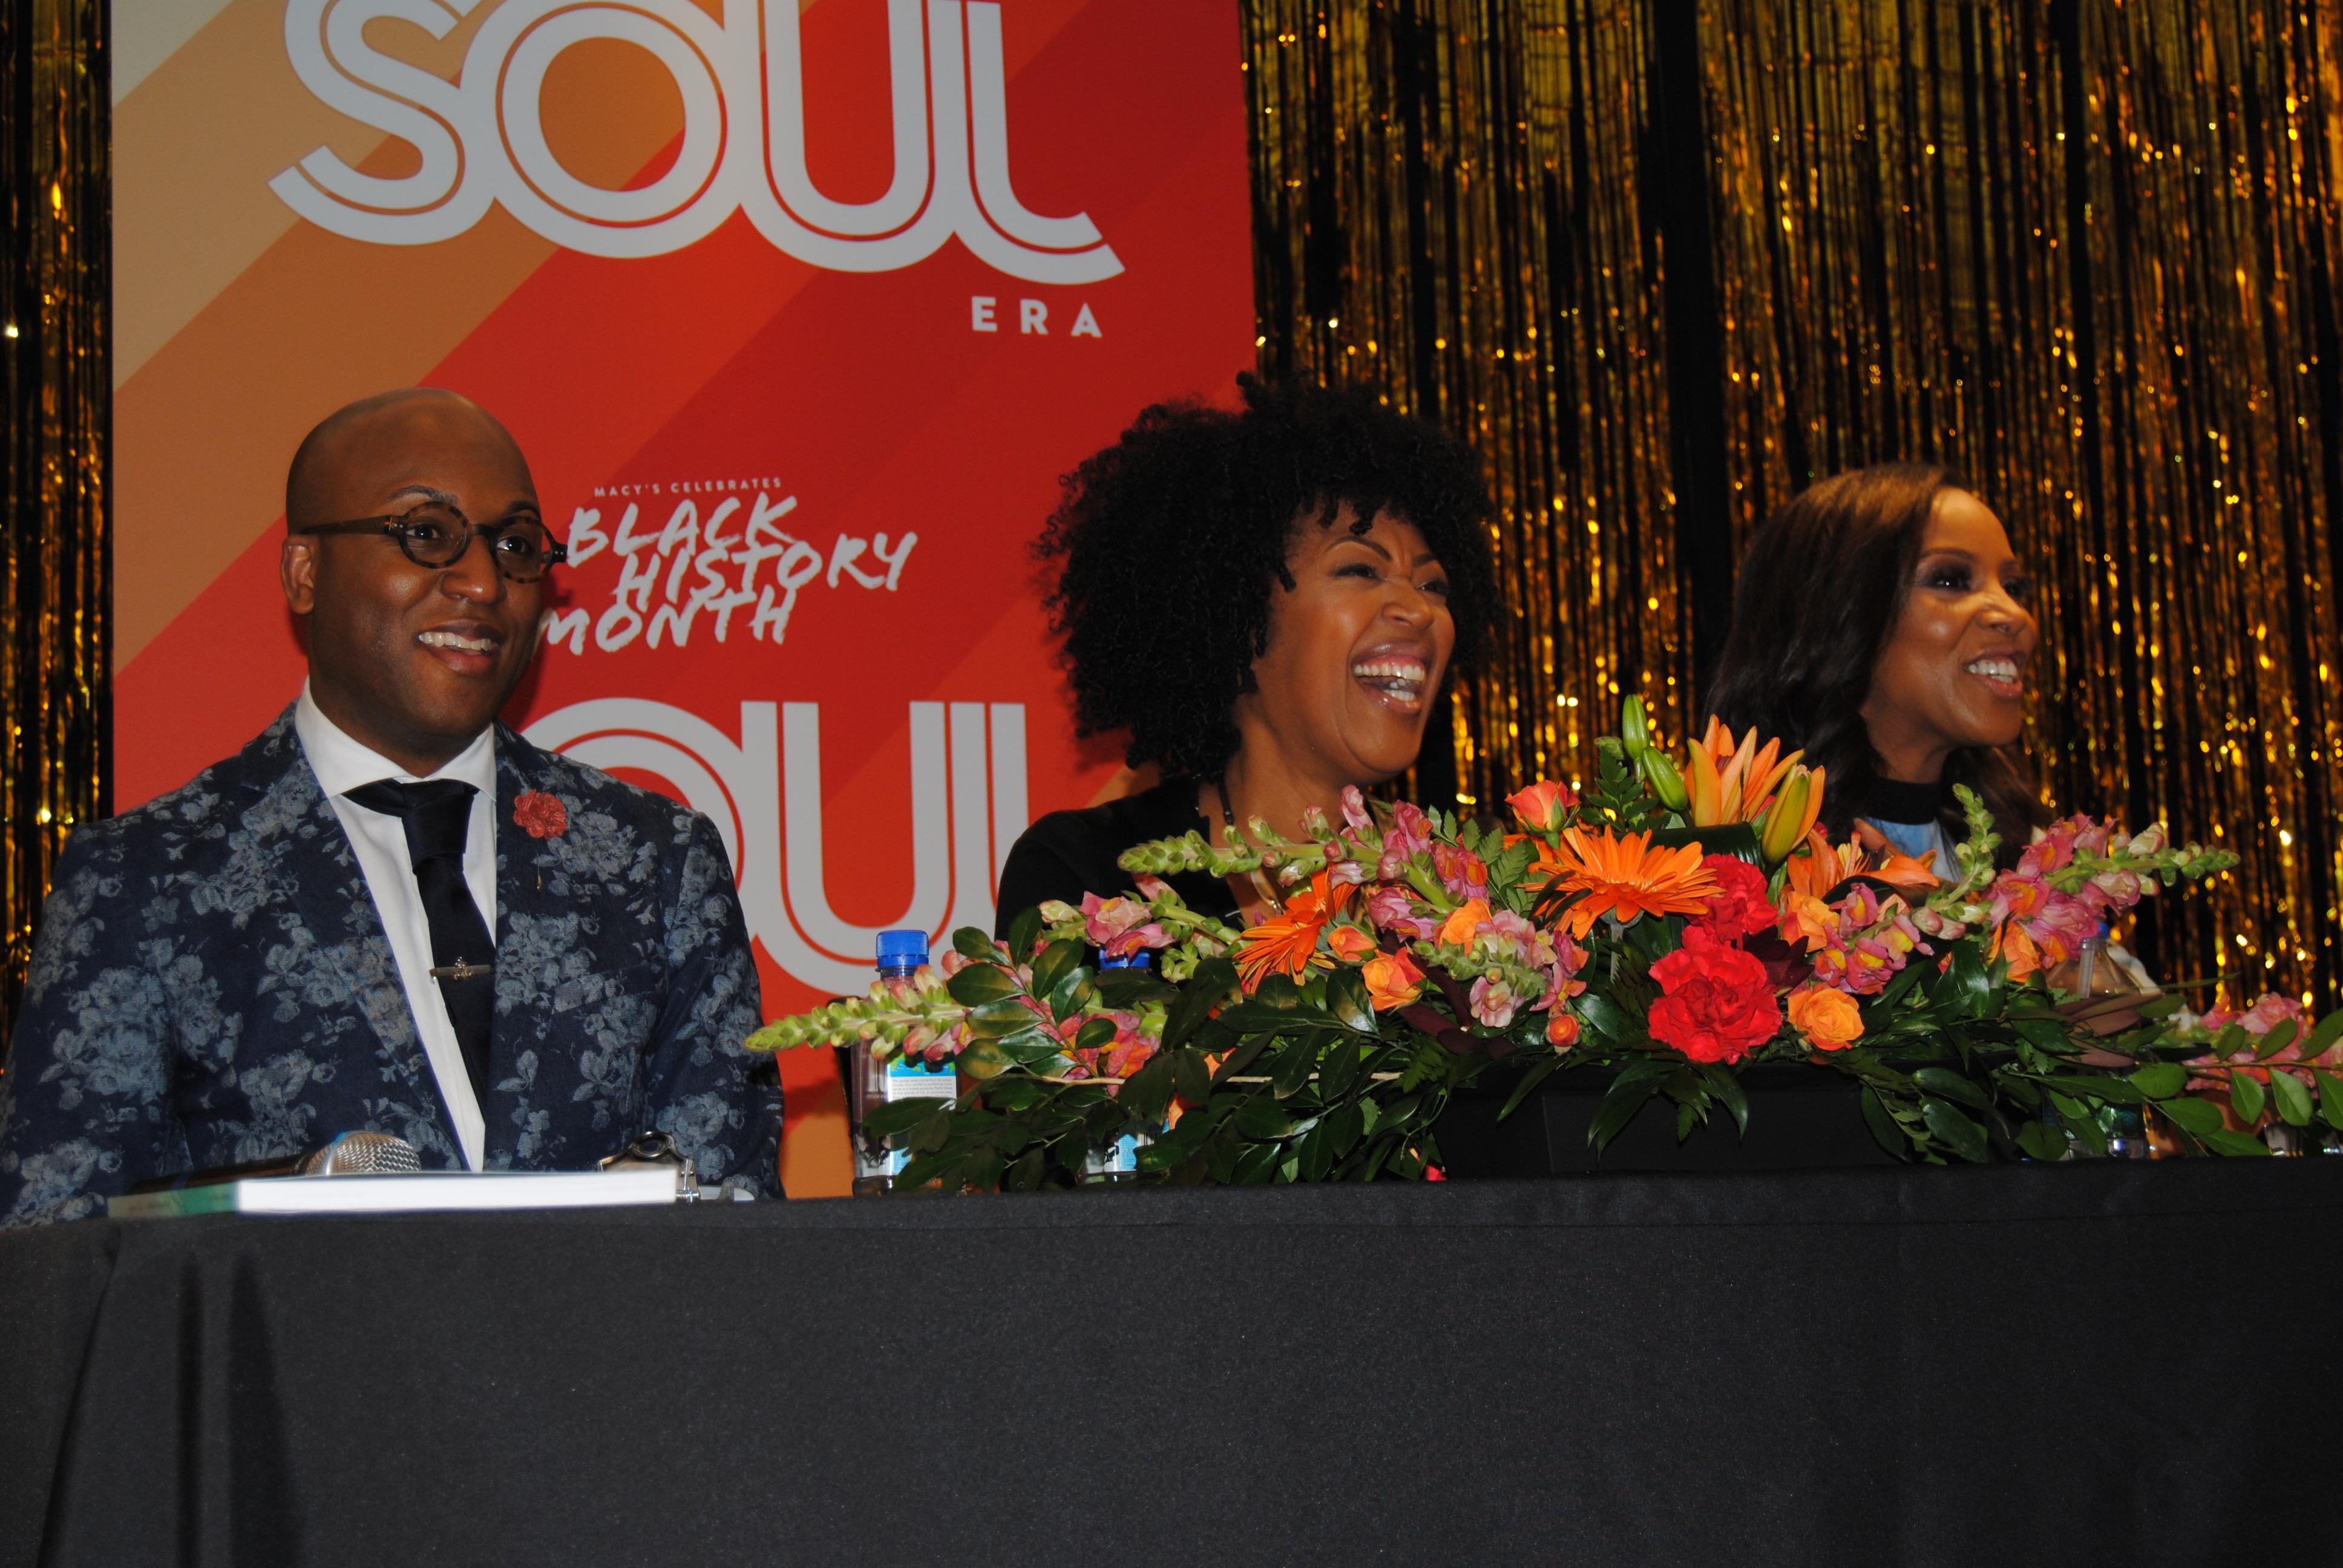 Macy's Celebrate Black History Month #TheSoulEra